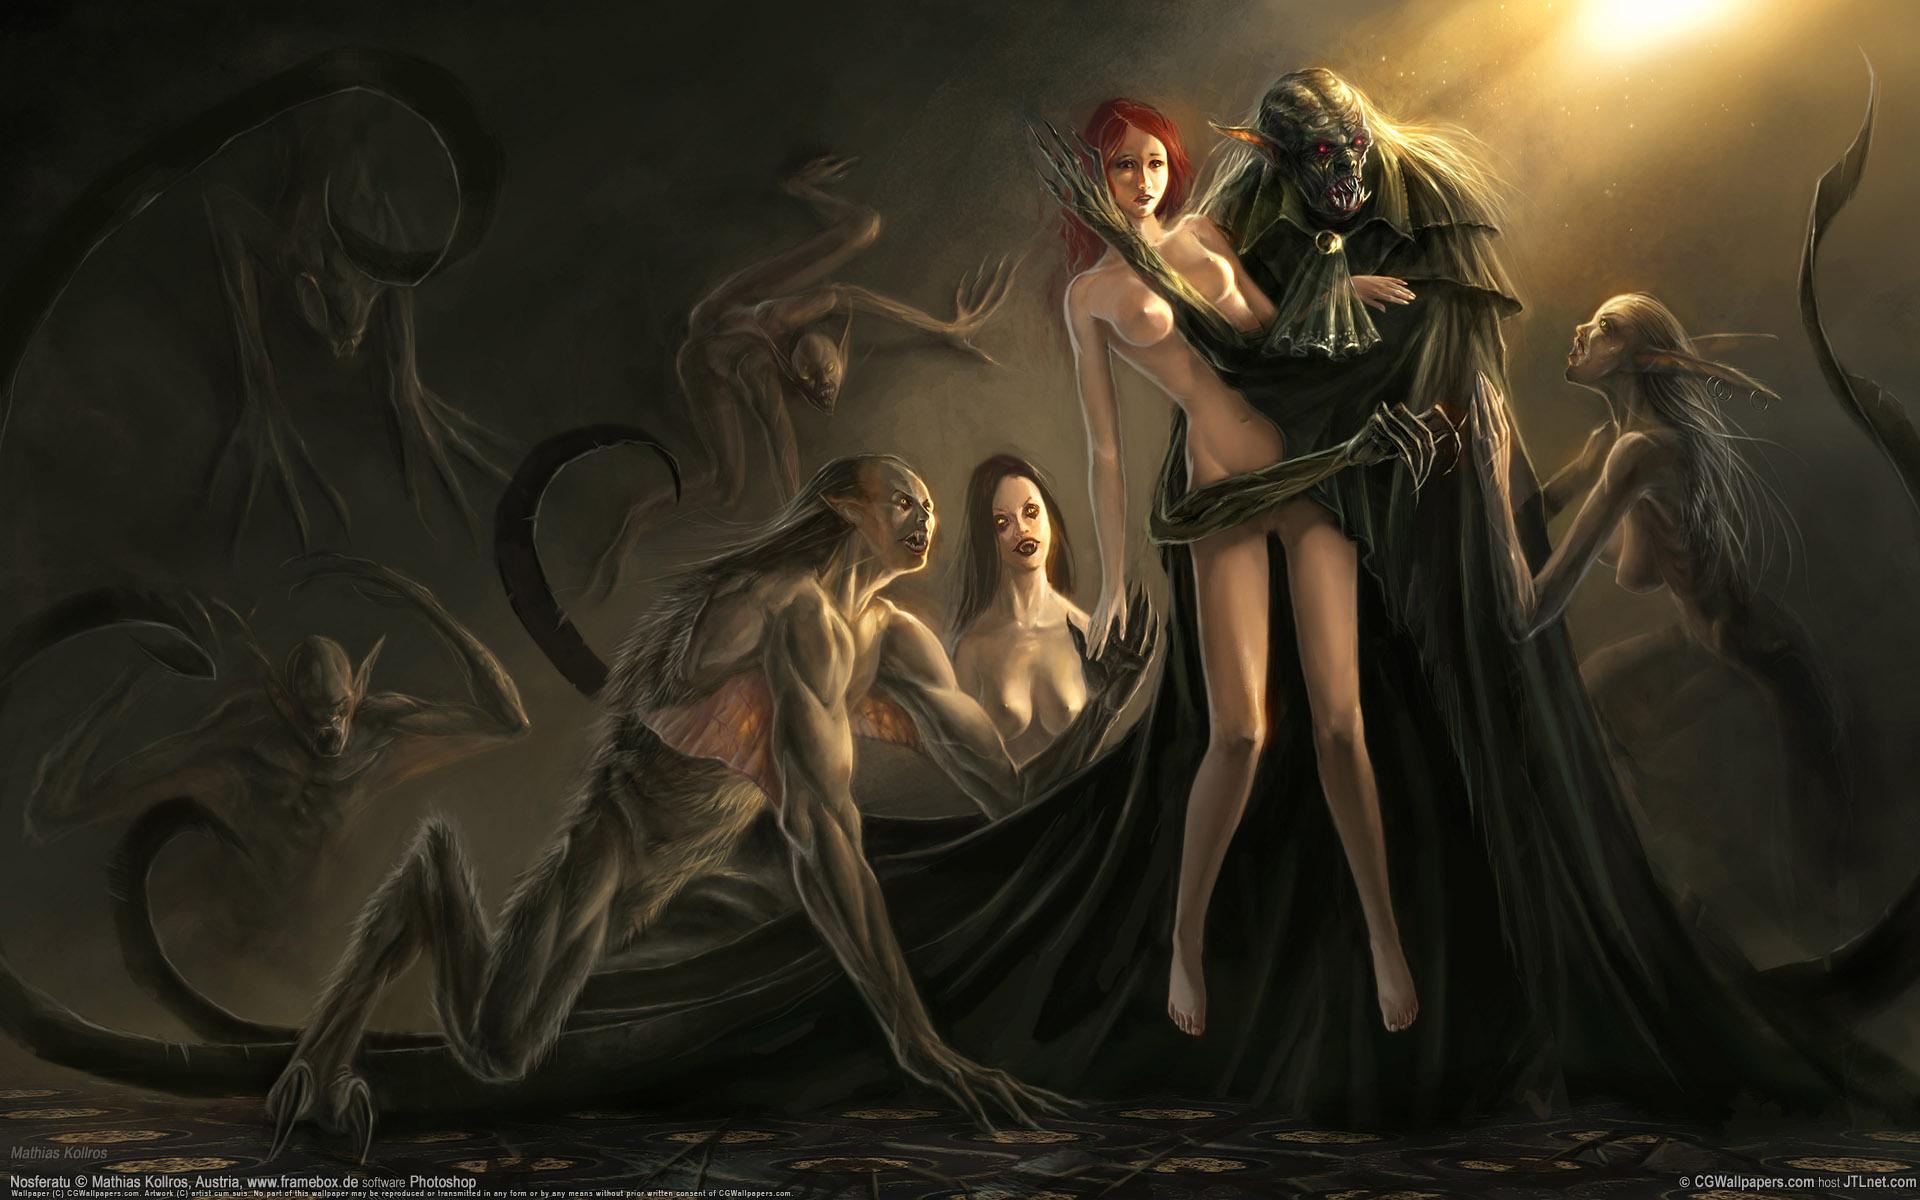 фэнтези девушки и монстры картинки